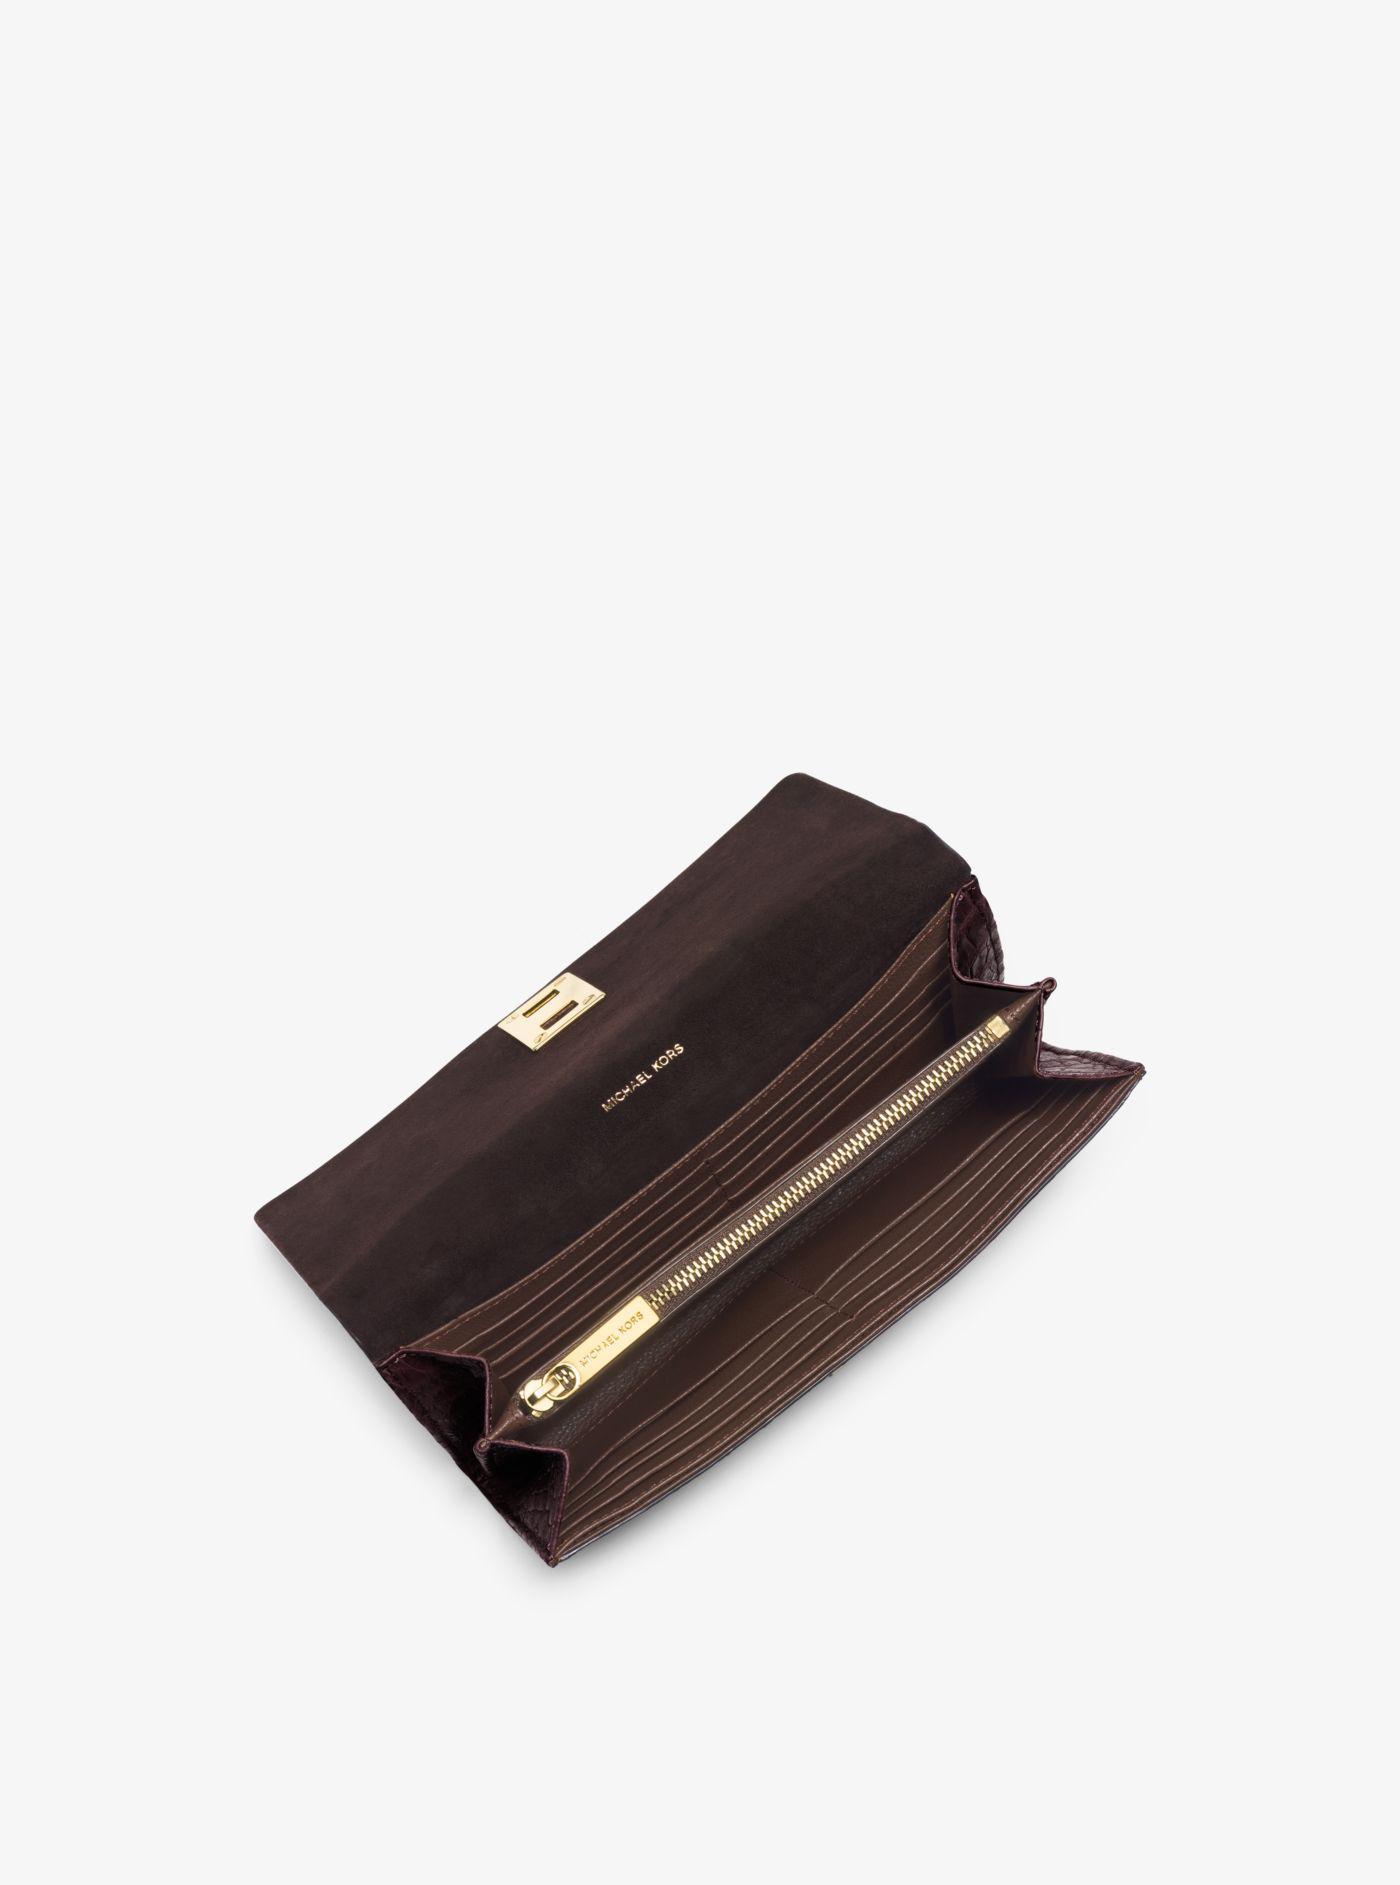 6b41af64c1b7 ... good lyst michael kors miranda continental wallet in purple for men  0a204 8fc17